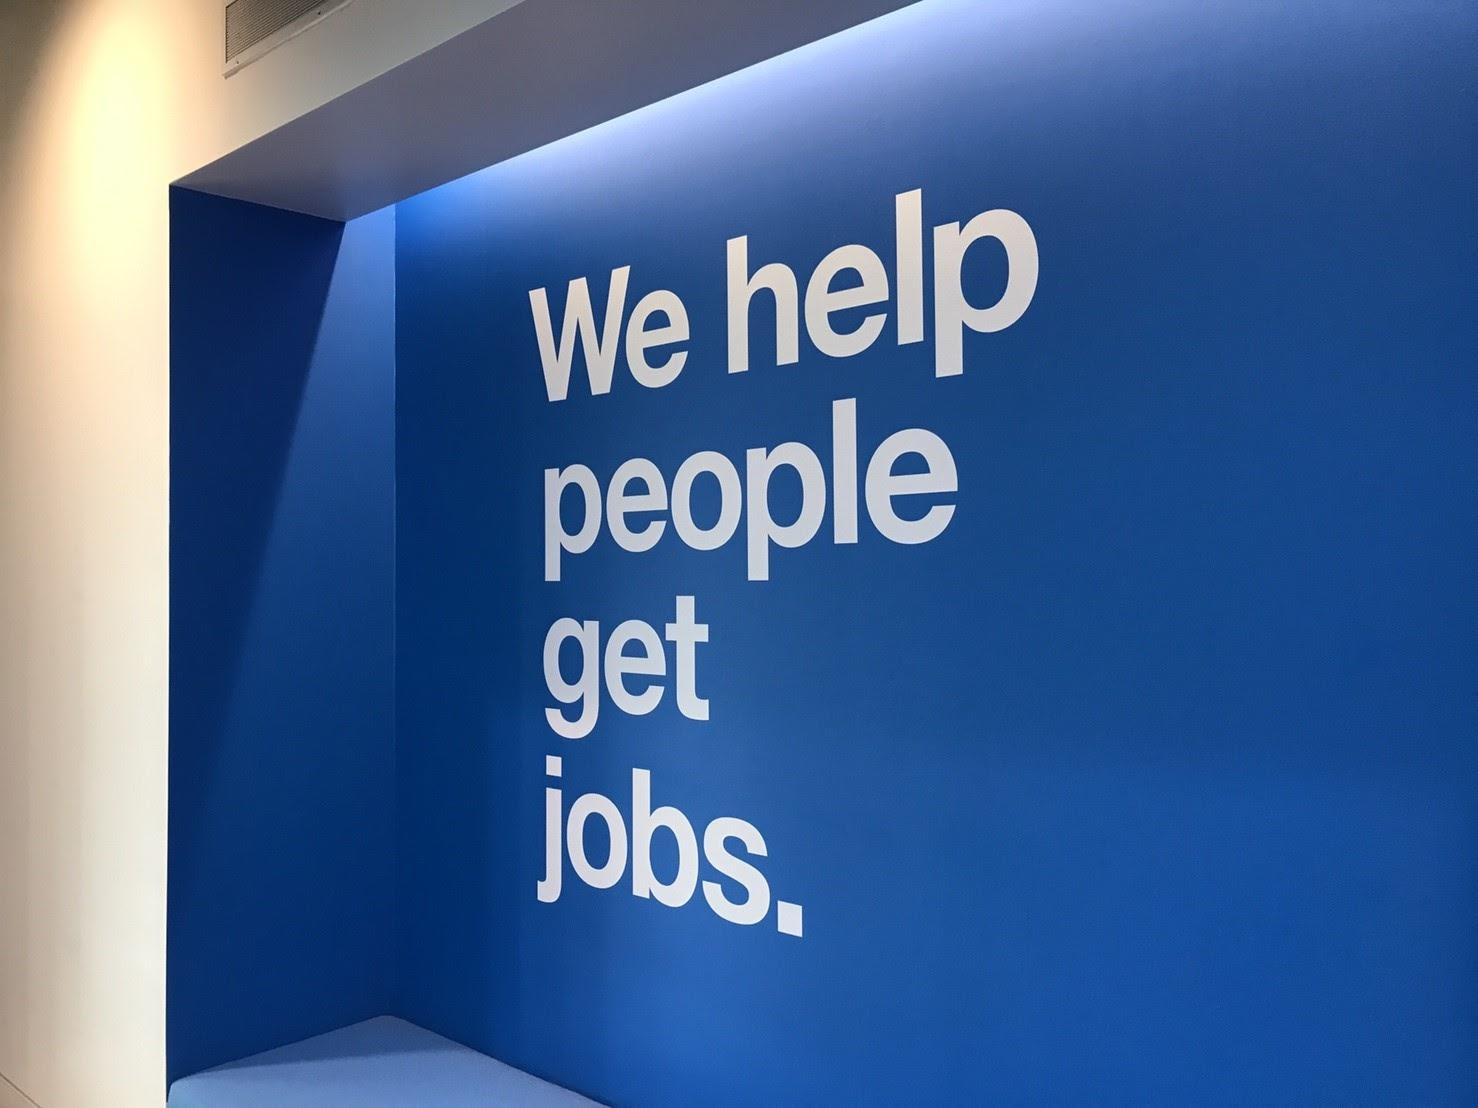 we help people get jobs.